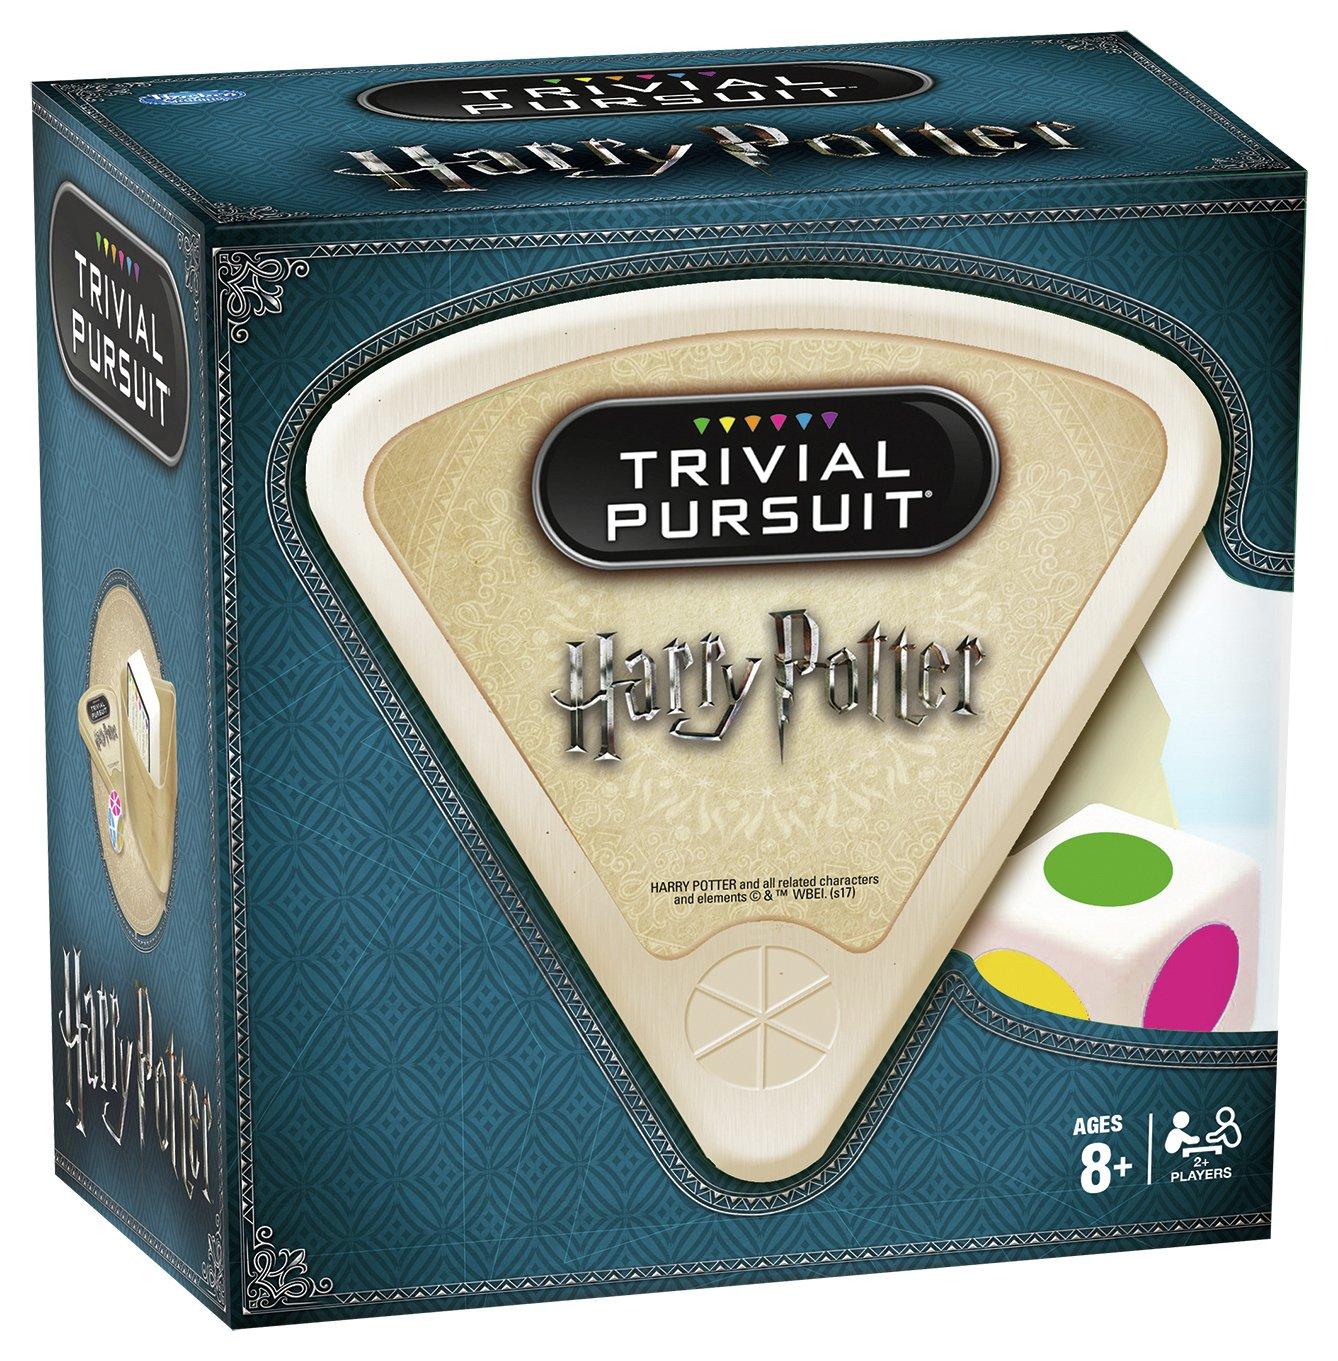 Trivial Pursuit Harry Potter Game.